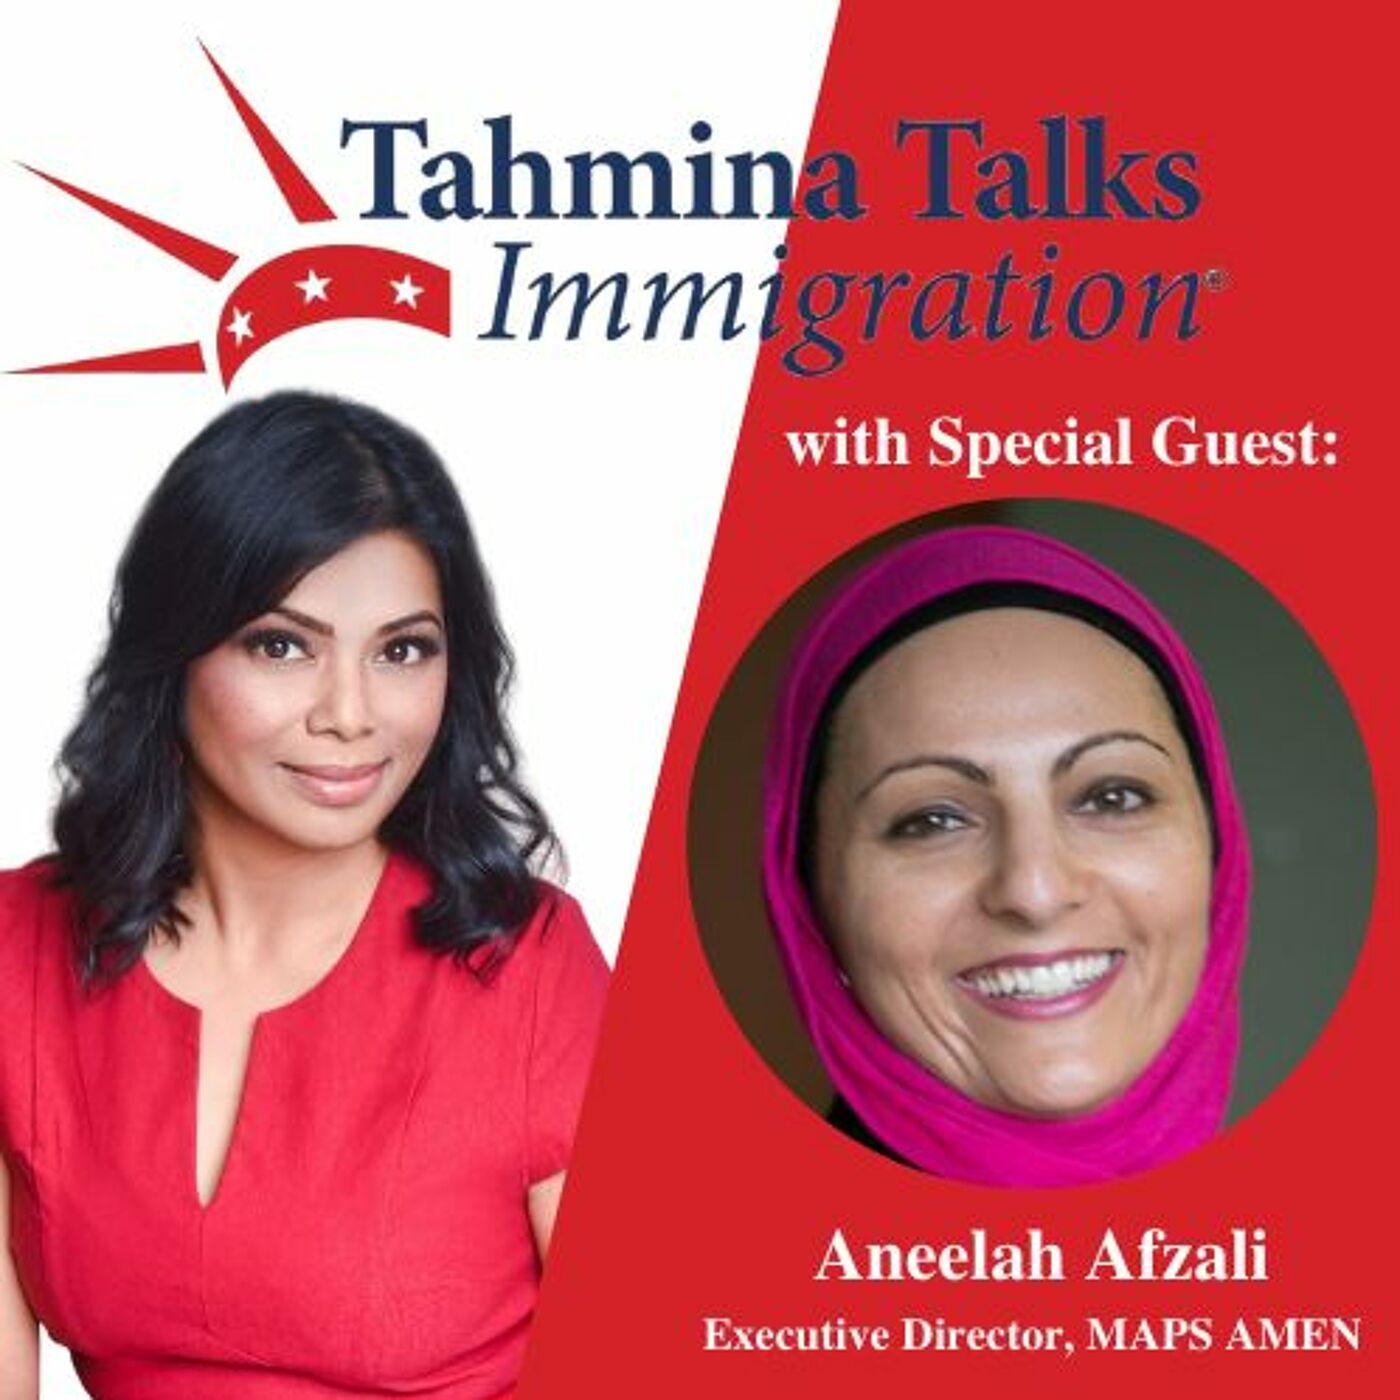 #112 Legal Heroes Series- Aneelah Afzali, Founder & Executive Director, MAPS AMEN